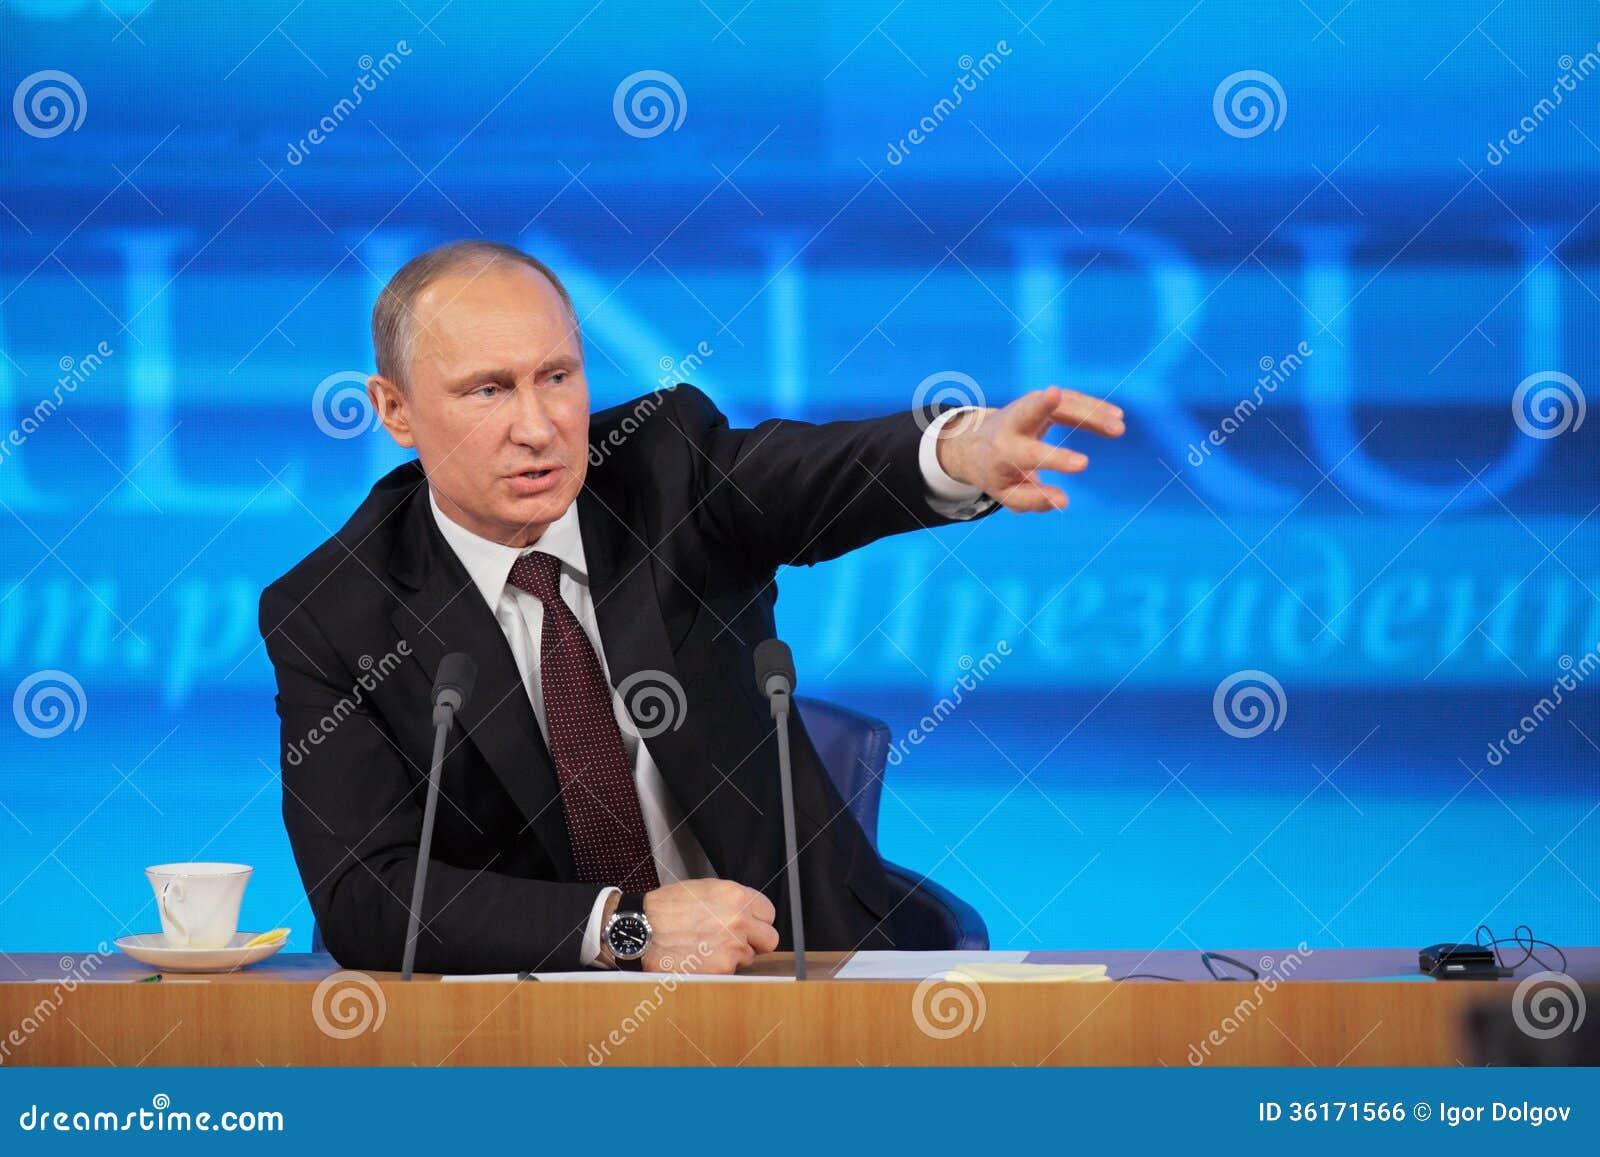 The Real Reason the US Media Hates Vladimir Putin